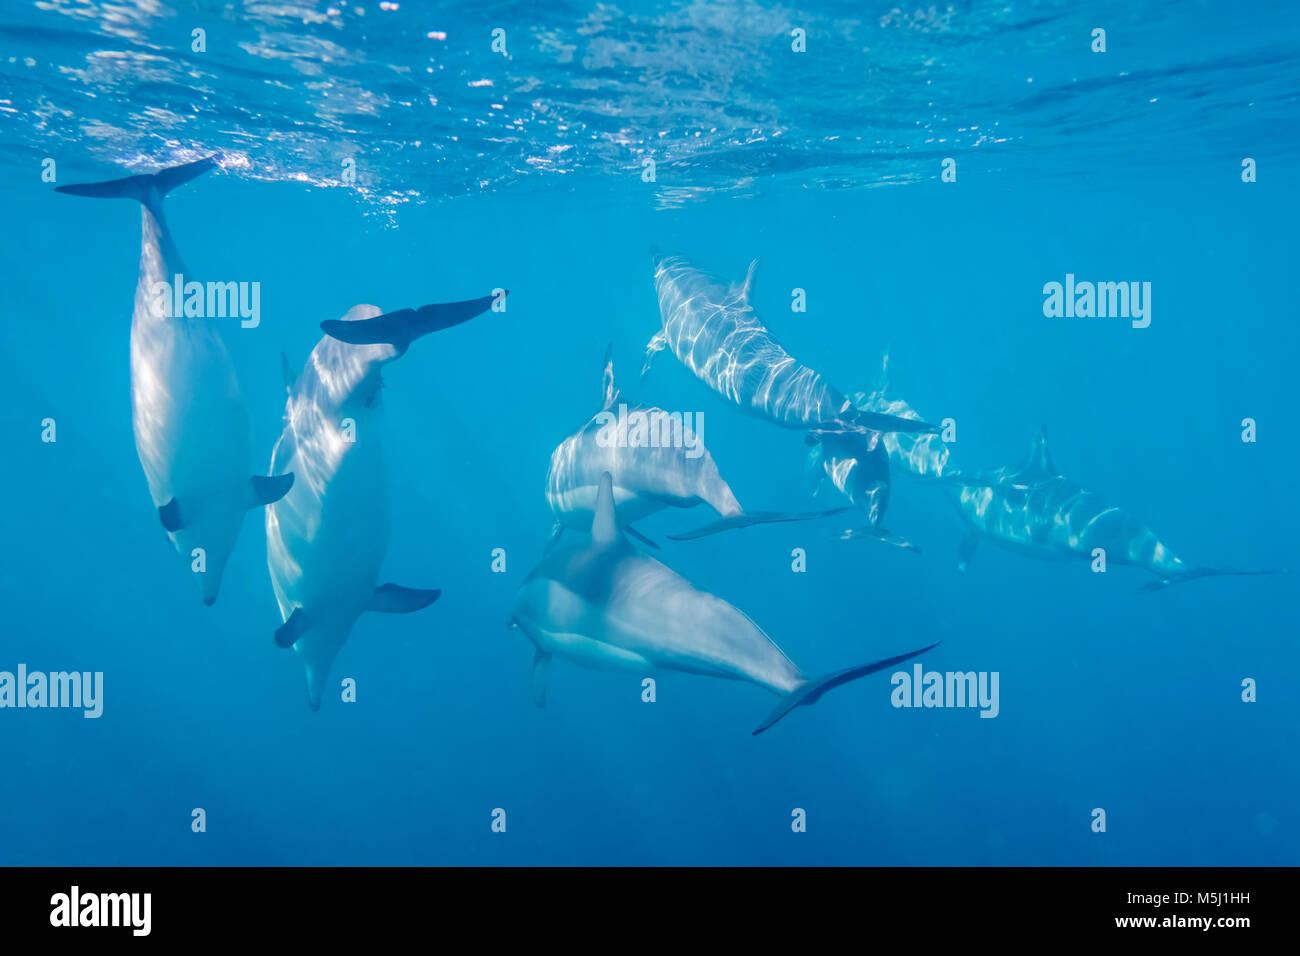 Mauritius, Indian Ocean, bottlenose dolphins, Tursiops truncatus - Stock Image